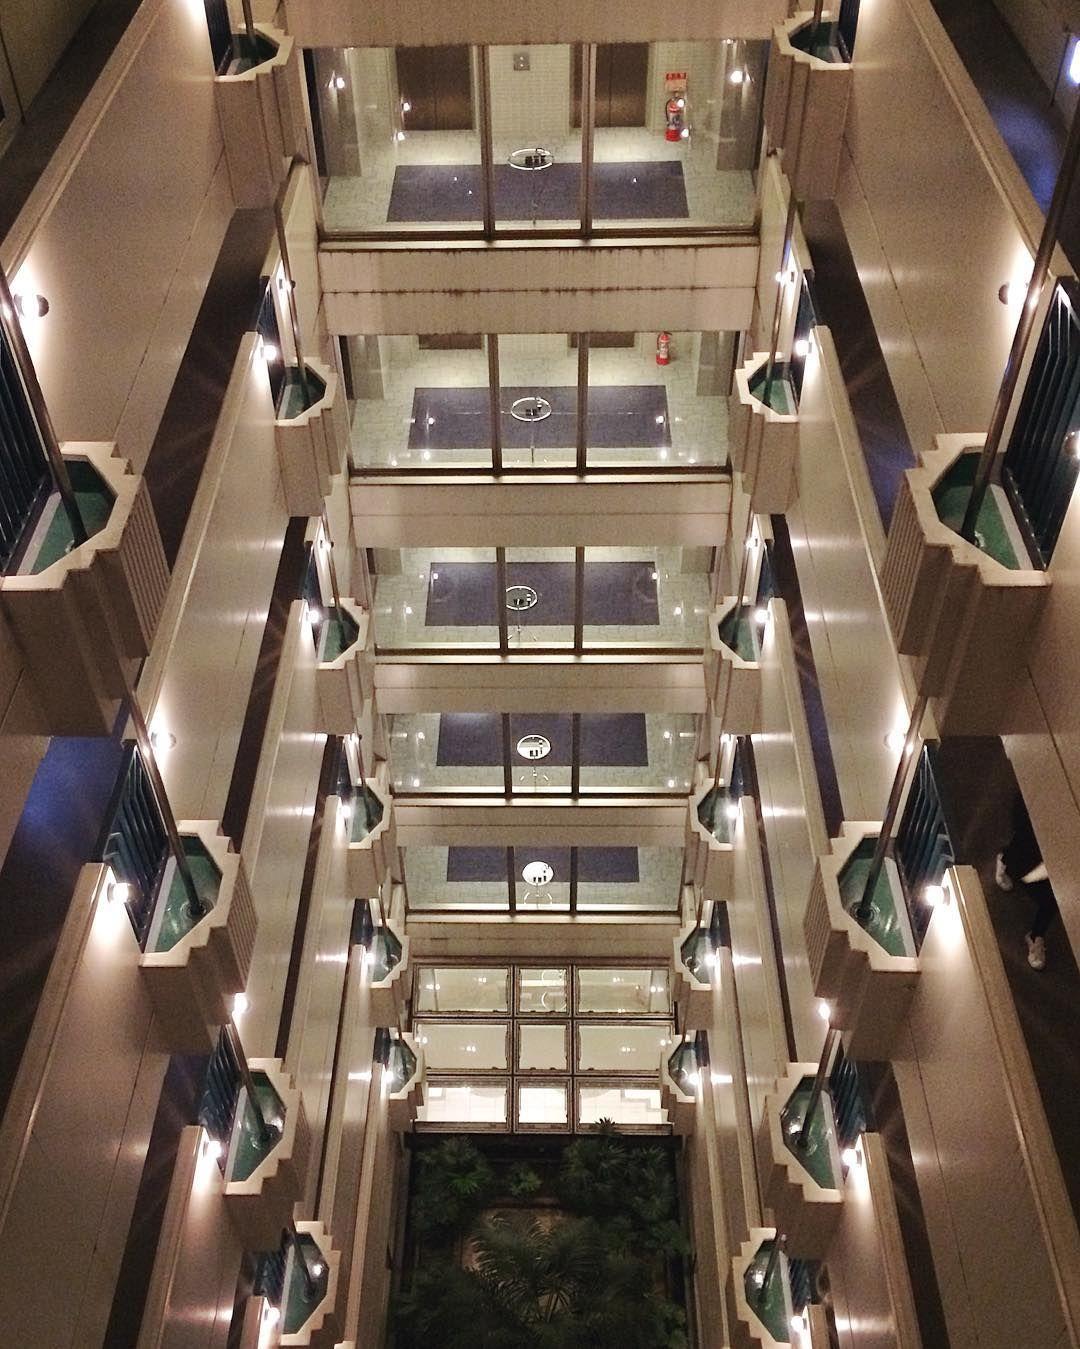 S Y M M E T R Y in Haneda, Japan // #haneda #japan #travel #architecture #symmetry #art http://tipsrazzi.com/ipost/1515061281764587013/?code=BUGlDVohrYF